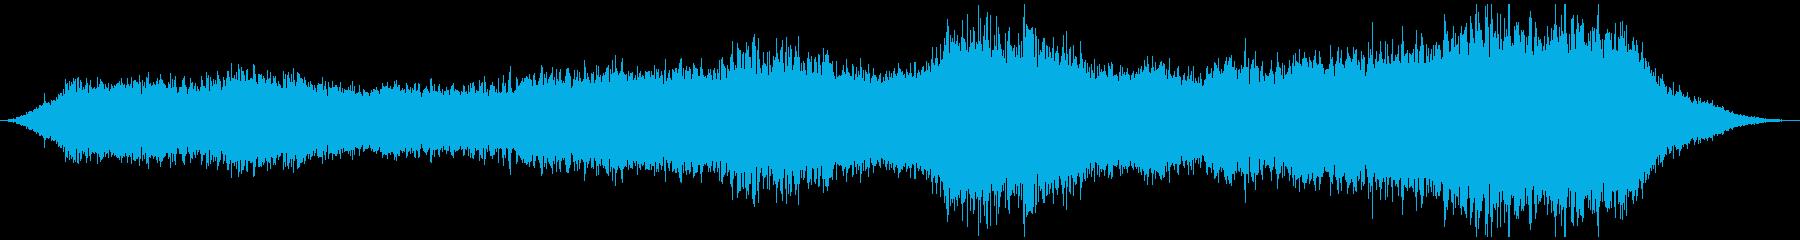 PADS スペース01の漂流の再生済みの波形